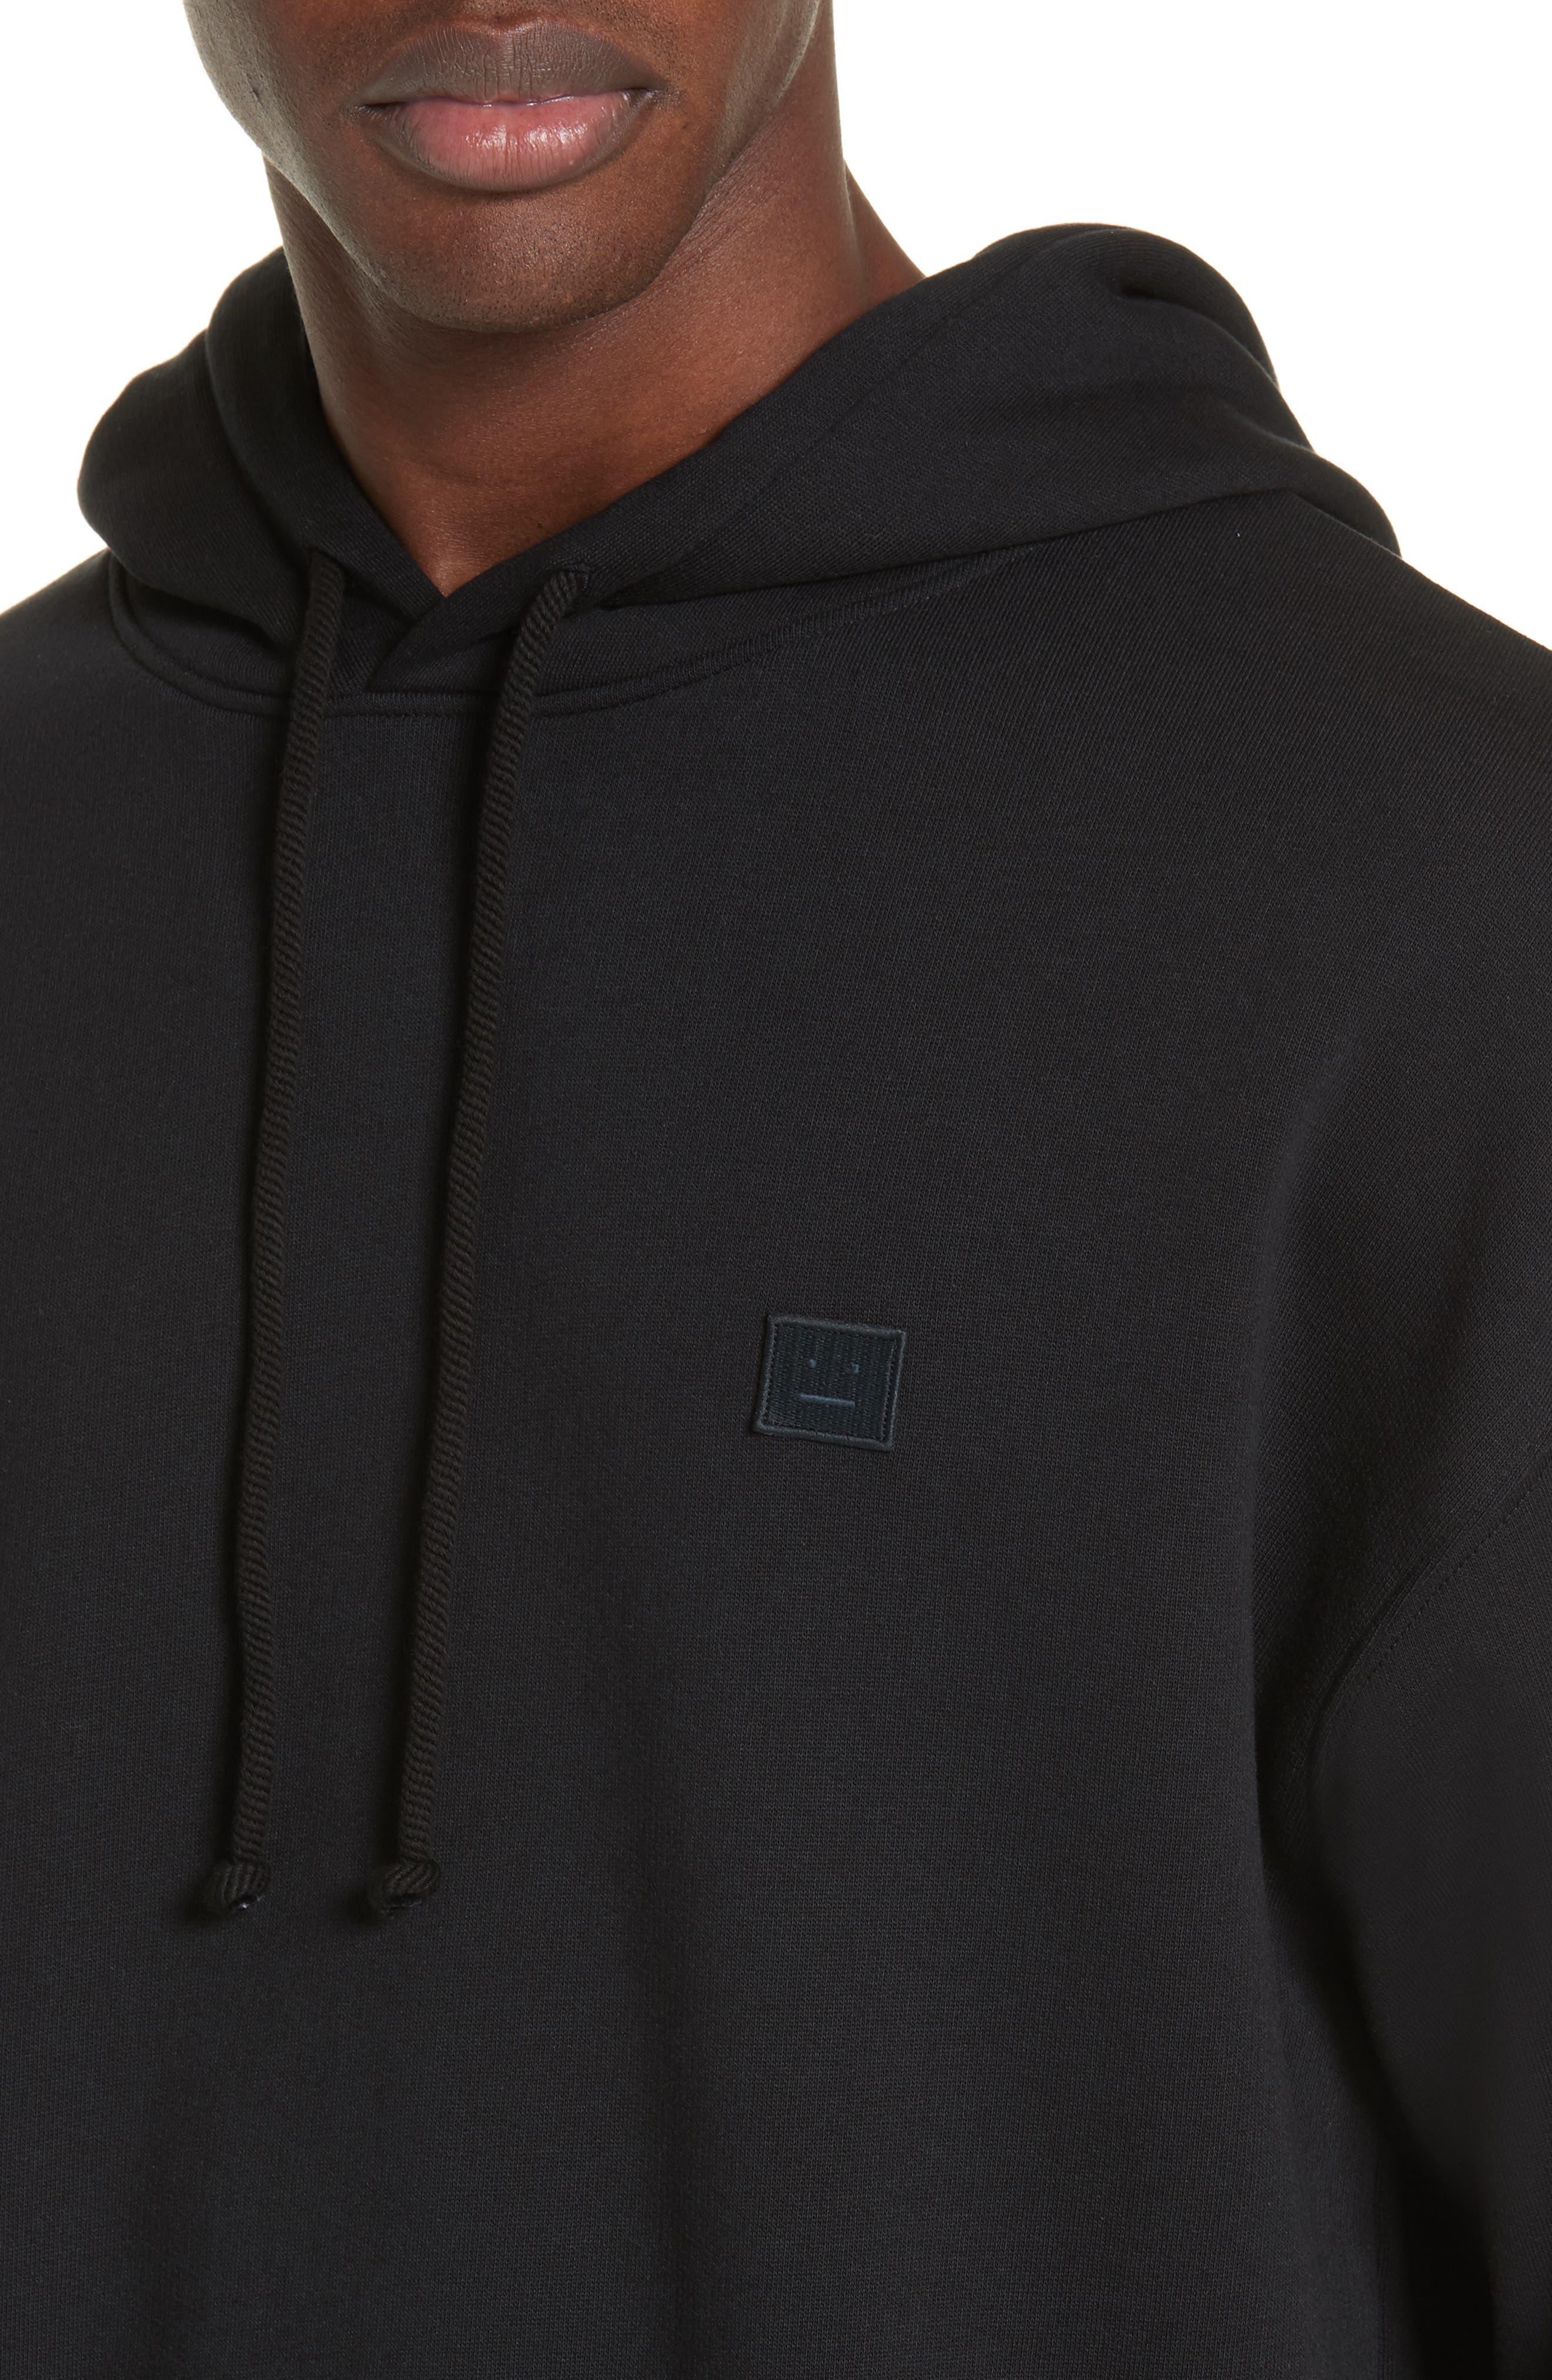 ACNE STUDIOS, Farrin Face Hooded Sweatshirt, Alternate thumbnail 4, color, BLACK